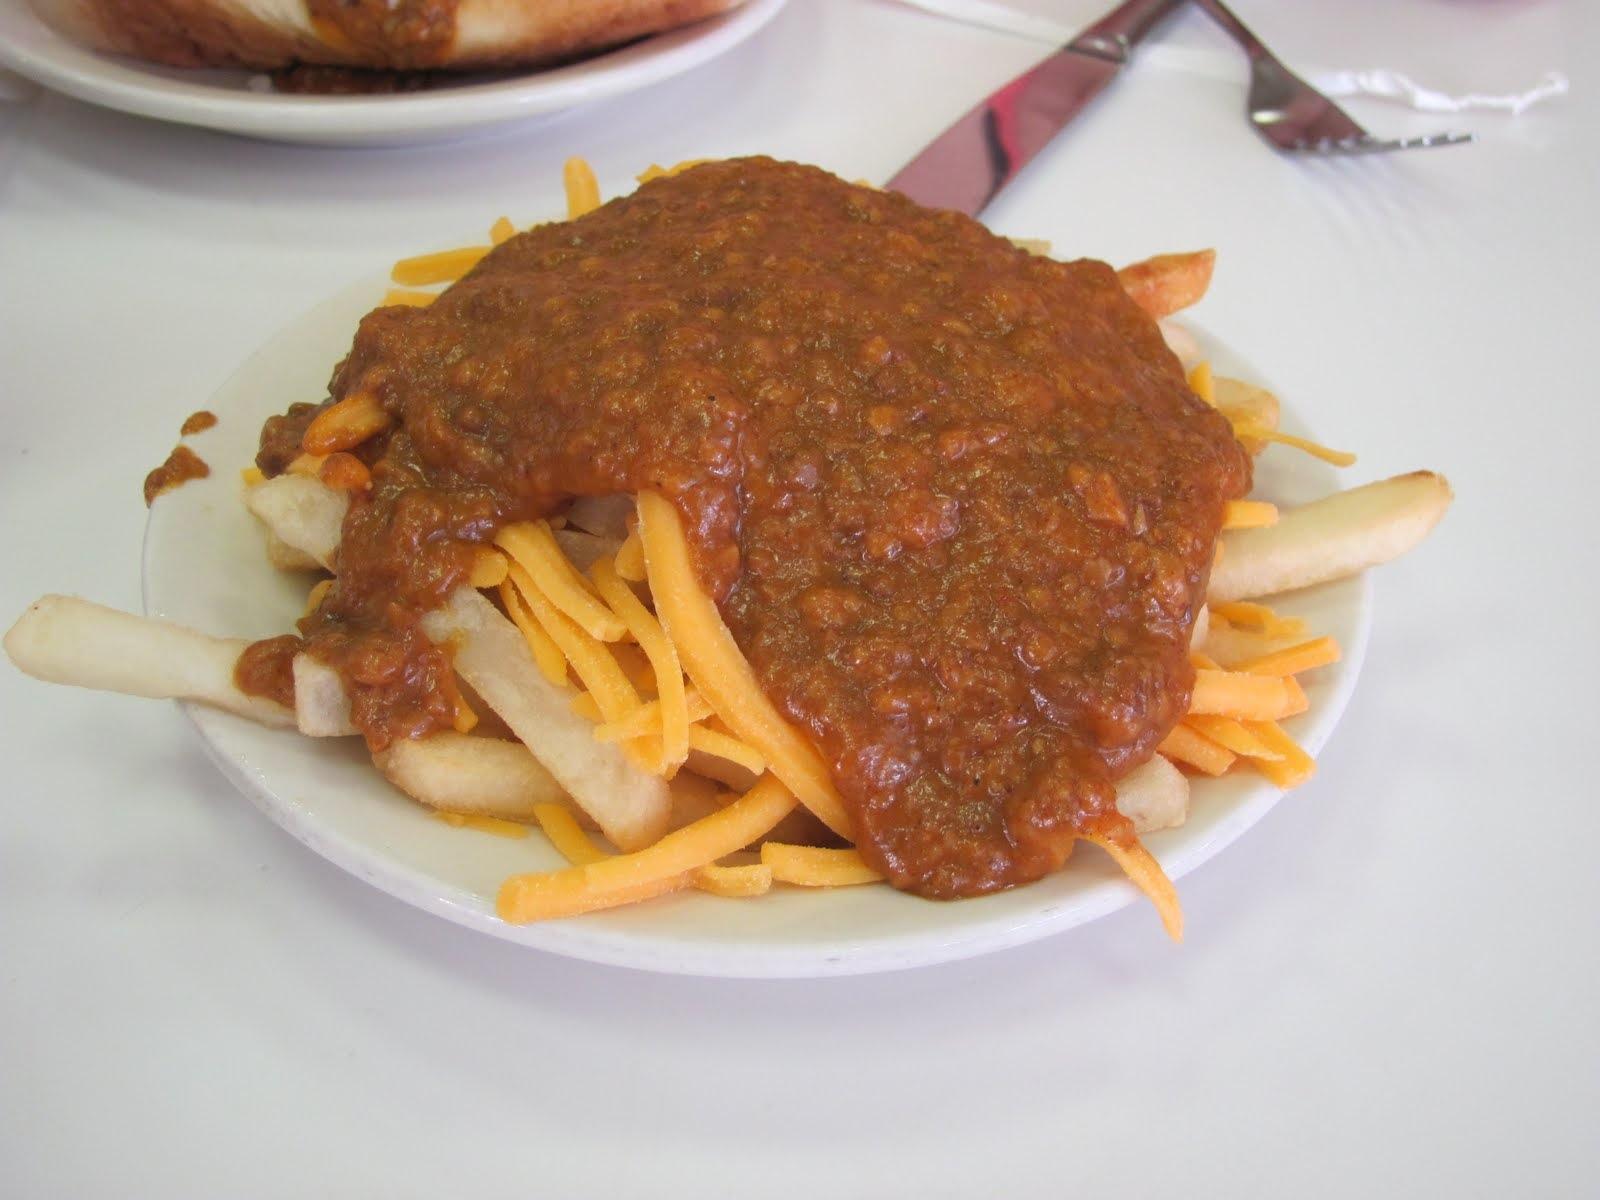 American Coney Chili Cheese Fries